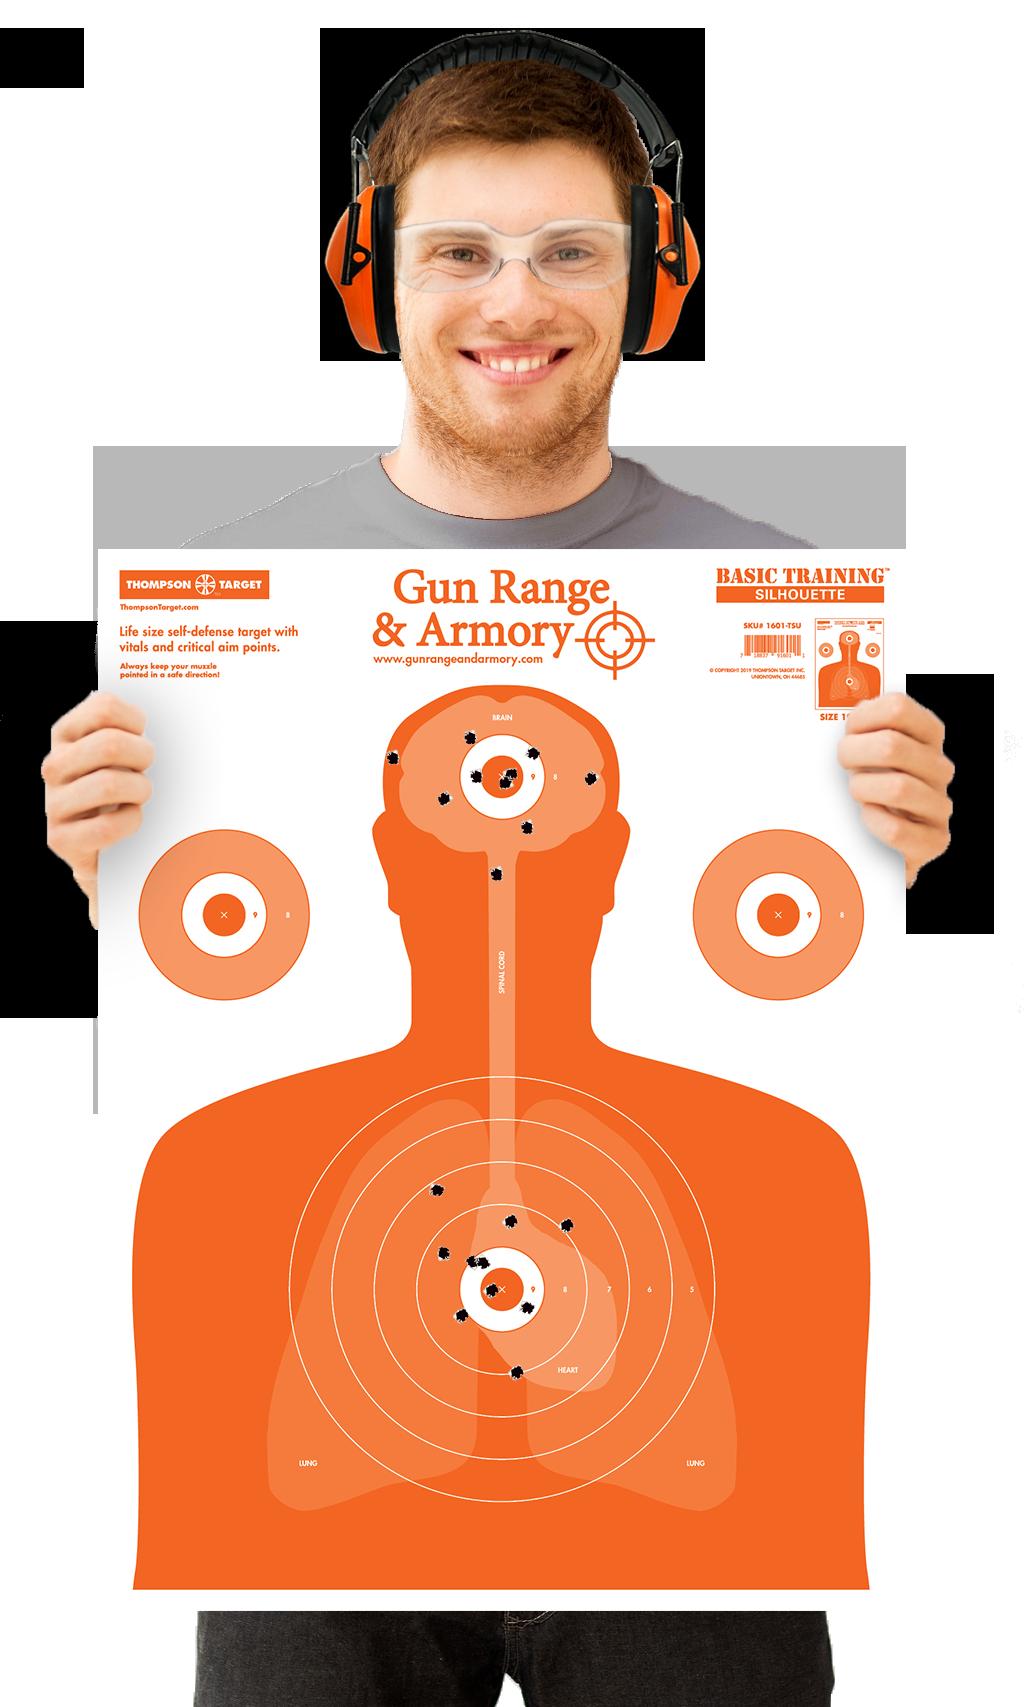 Man Holding Silhouette Shooting Target